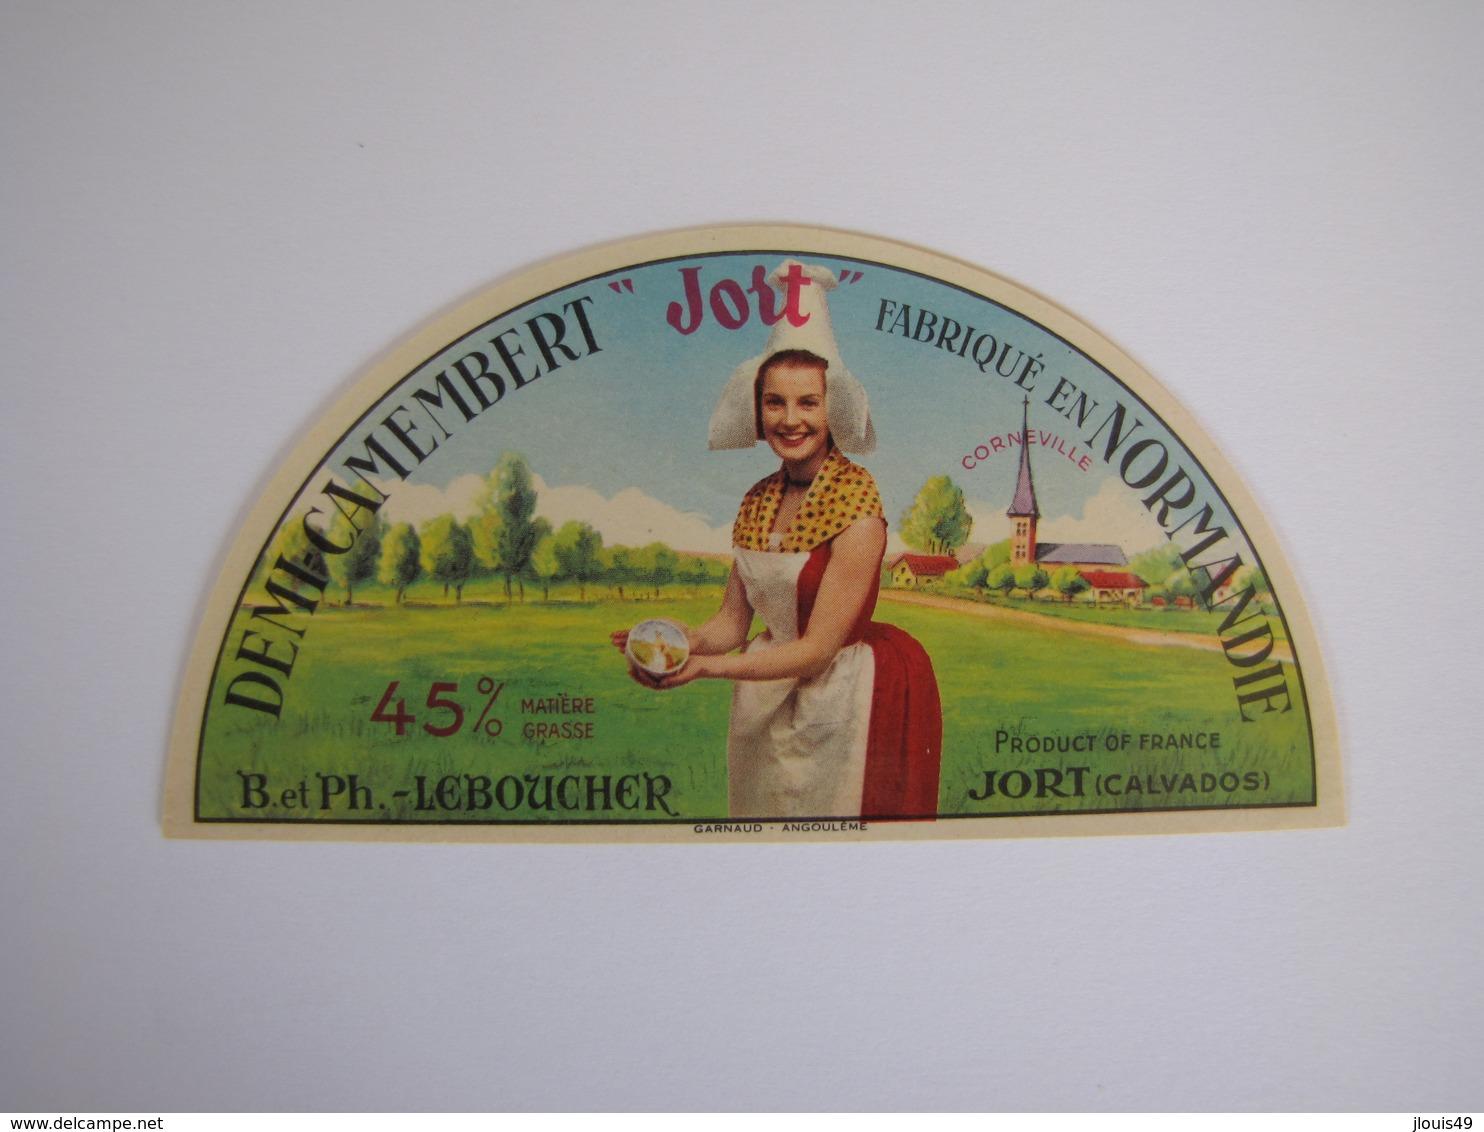 Etiquette De Fromage DEMI CAMEMBERT JORT Fabriqué En NORMANDIE 45% - Fromage